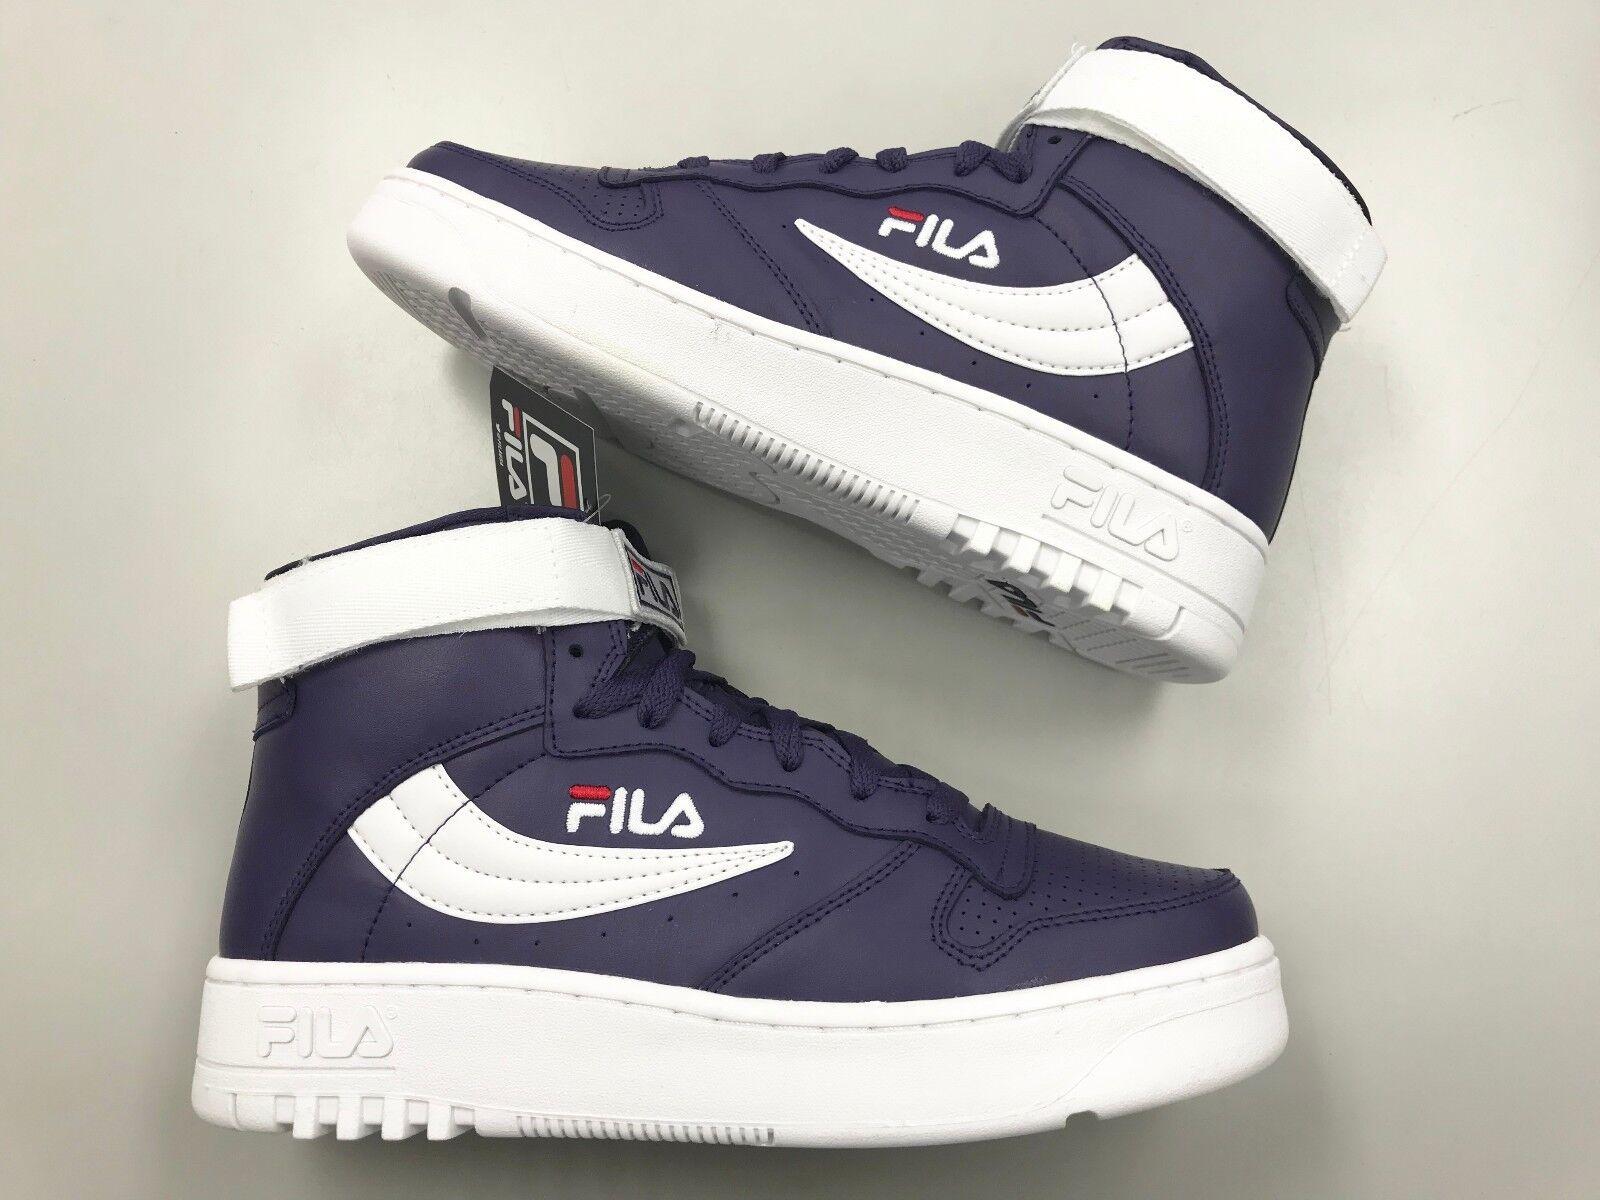 Brand New FILA FX-100 retro Purple White Red High Top Uomo shoes vtg fitness